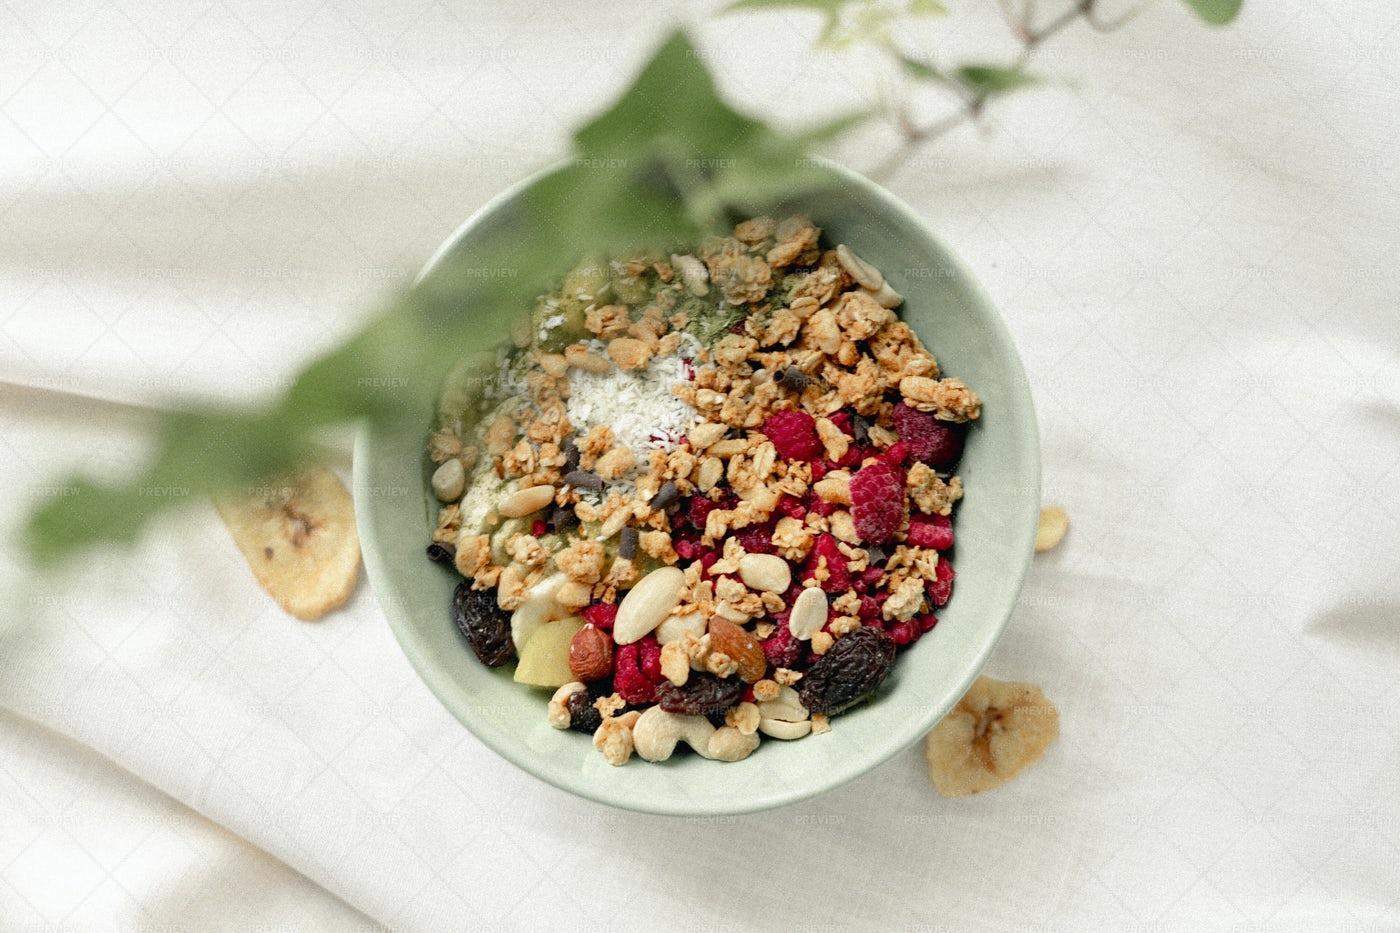 Granola For Breakfast: Stock Photos